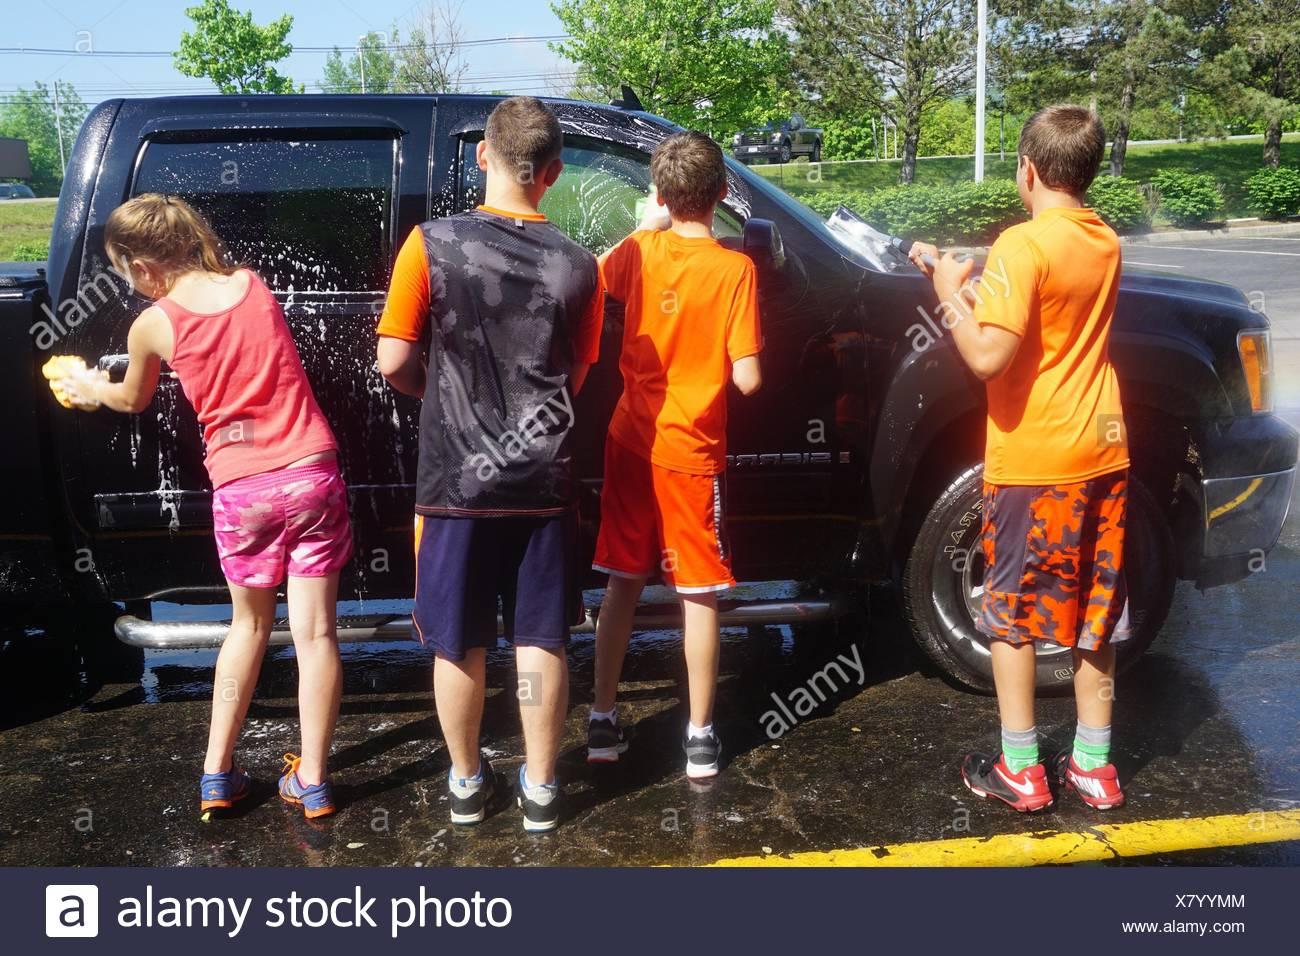 Preteen Boys and Girl Washing Car, Wellsville, New York, USA. - Stock Image